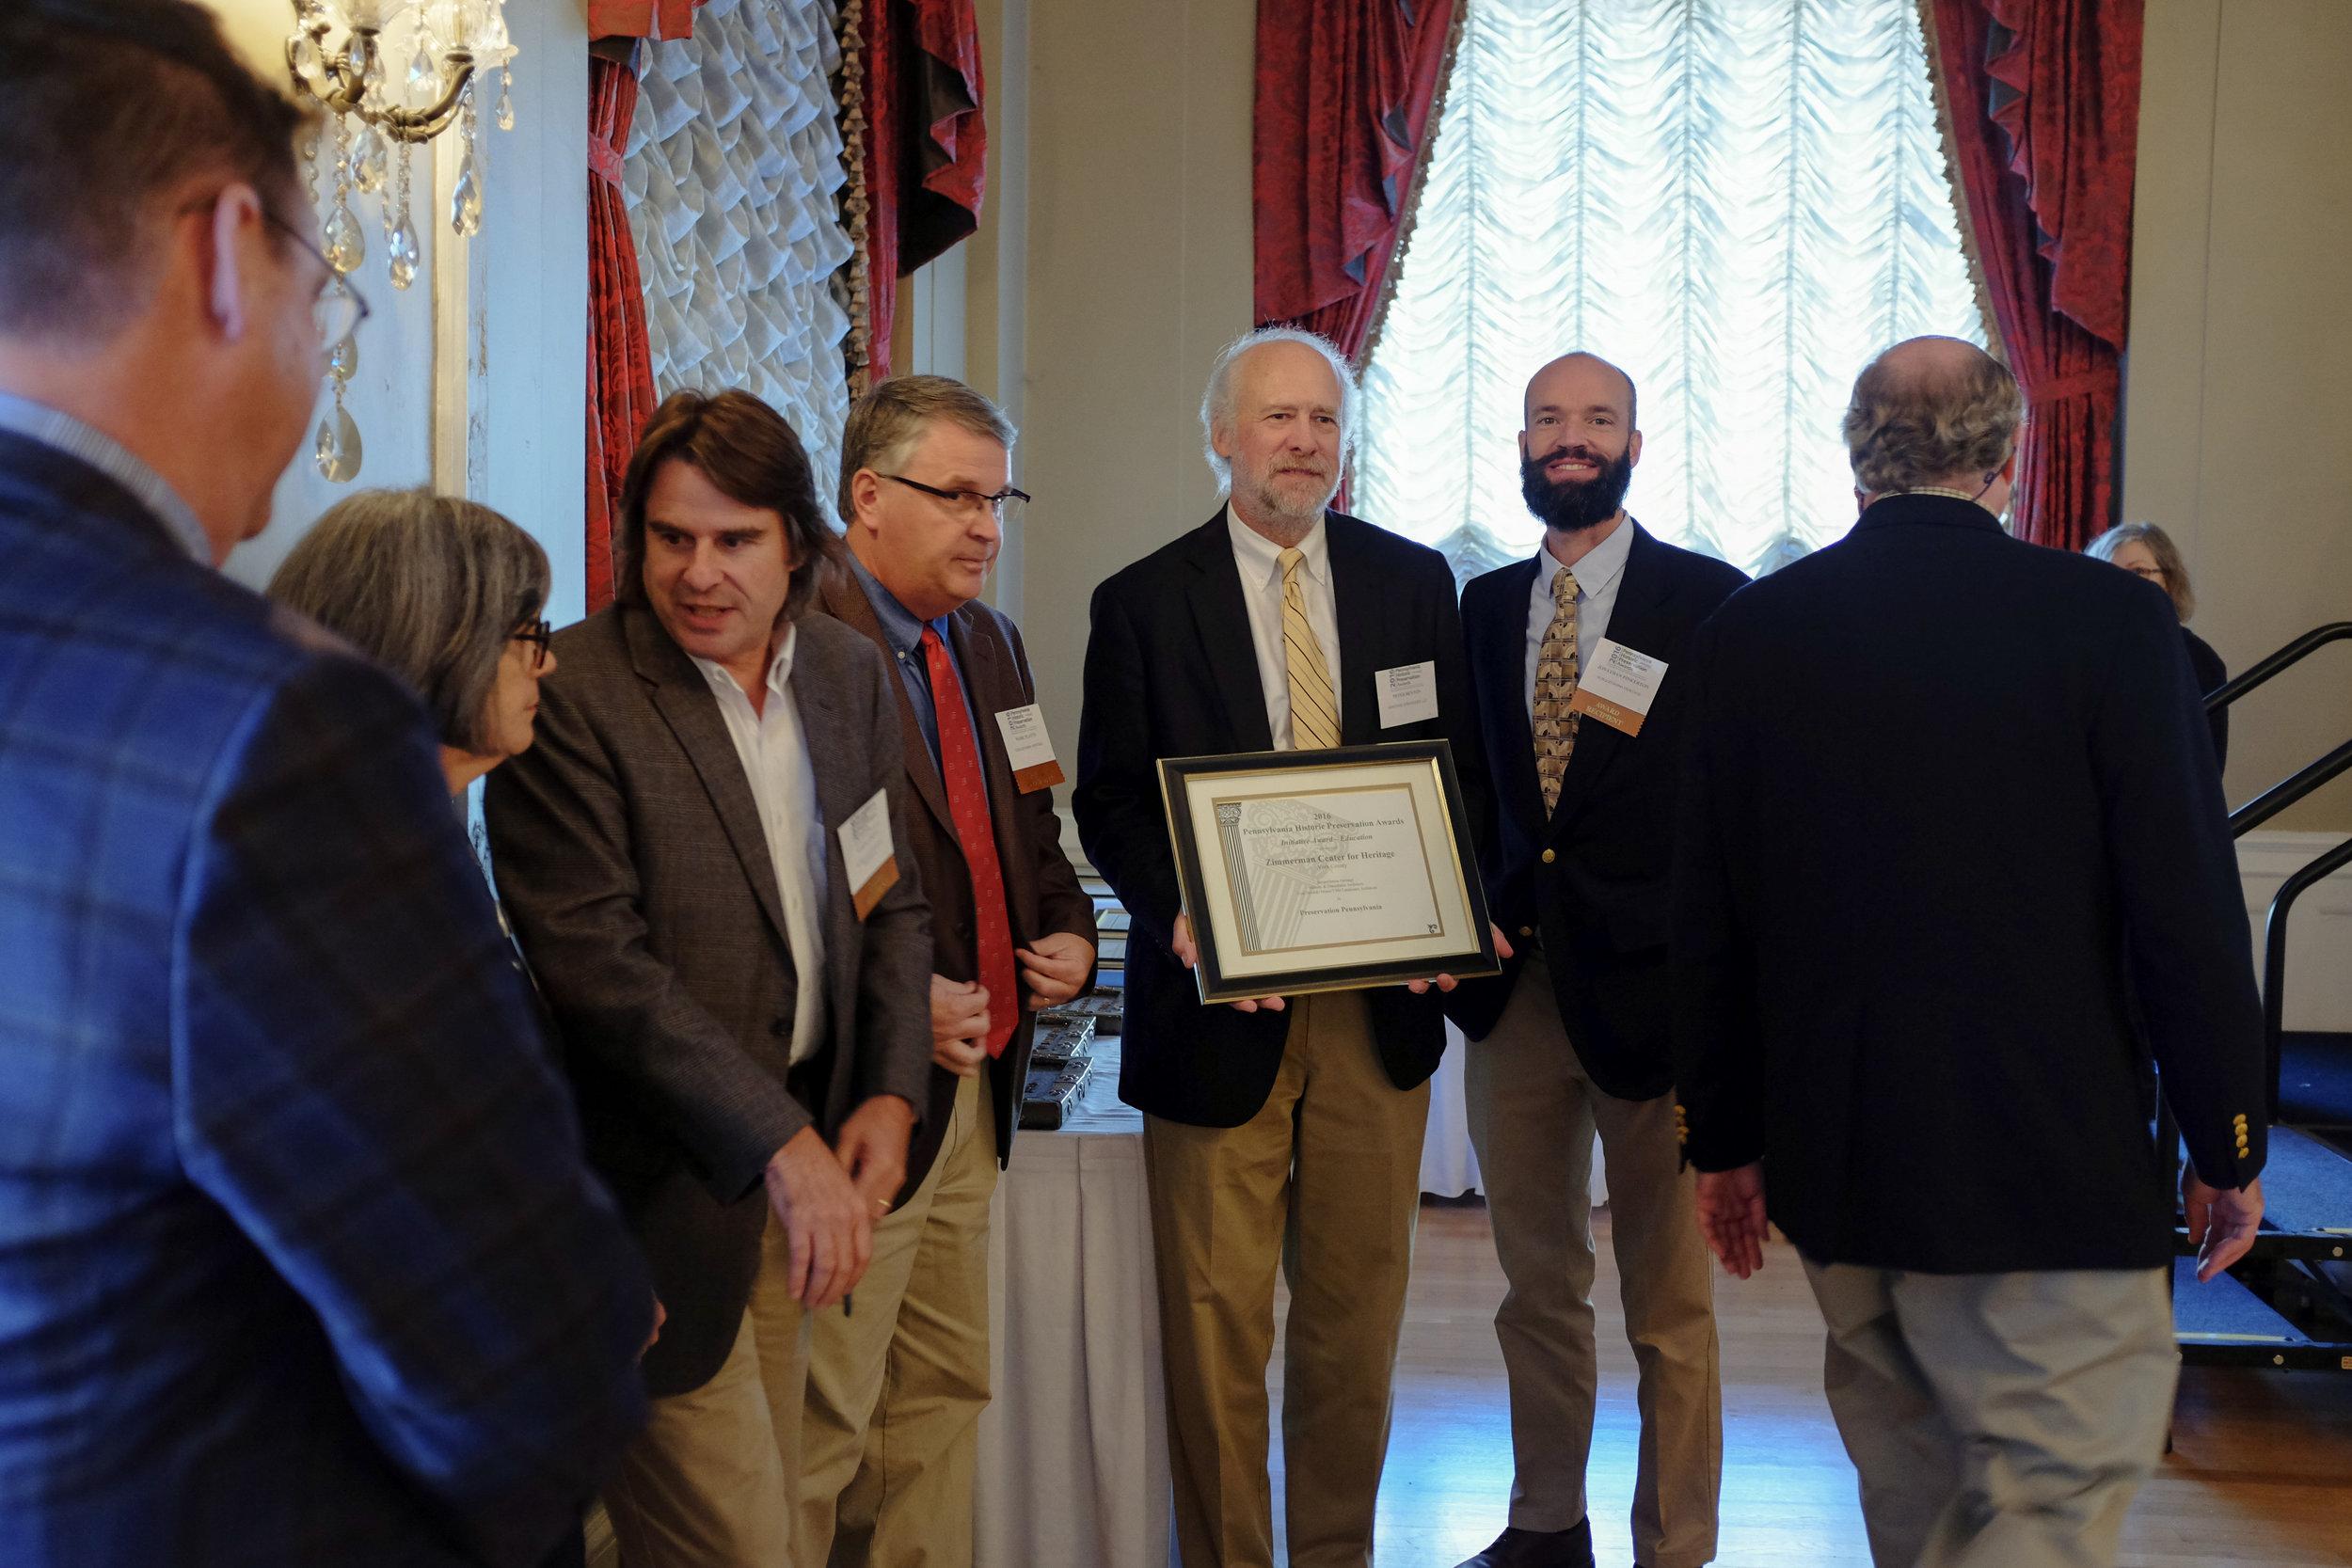 2016-pa-historic-preservation-awards_29693771573_o.jpg